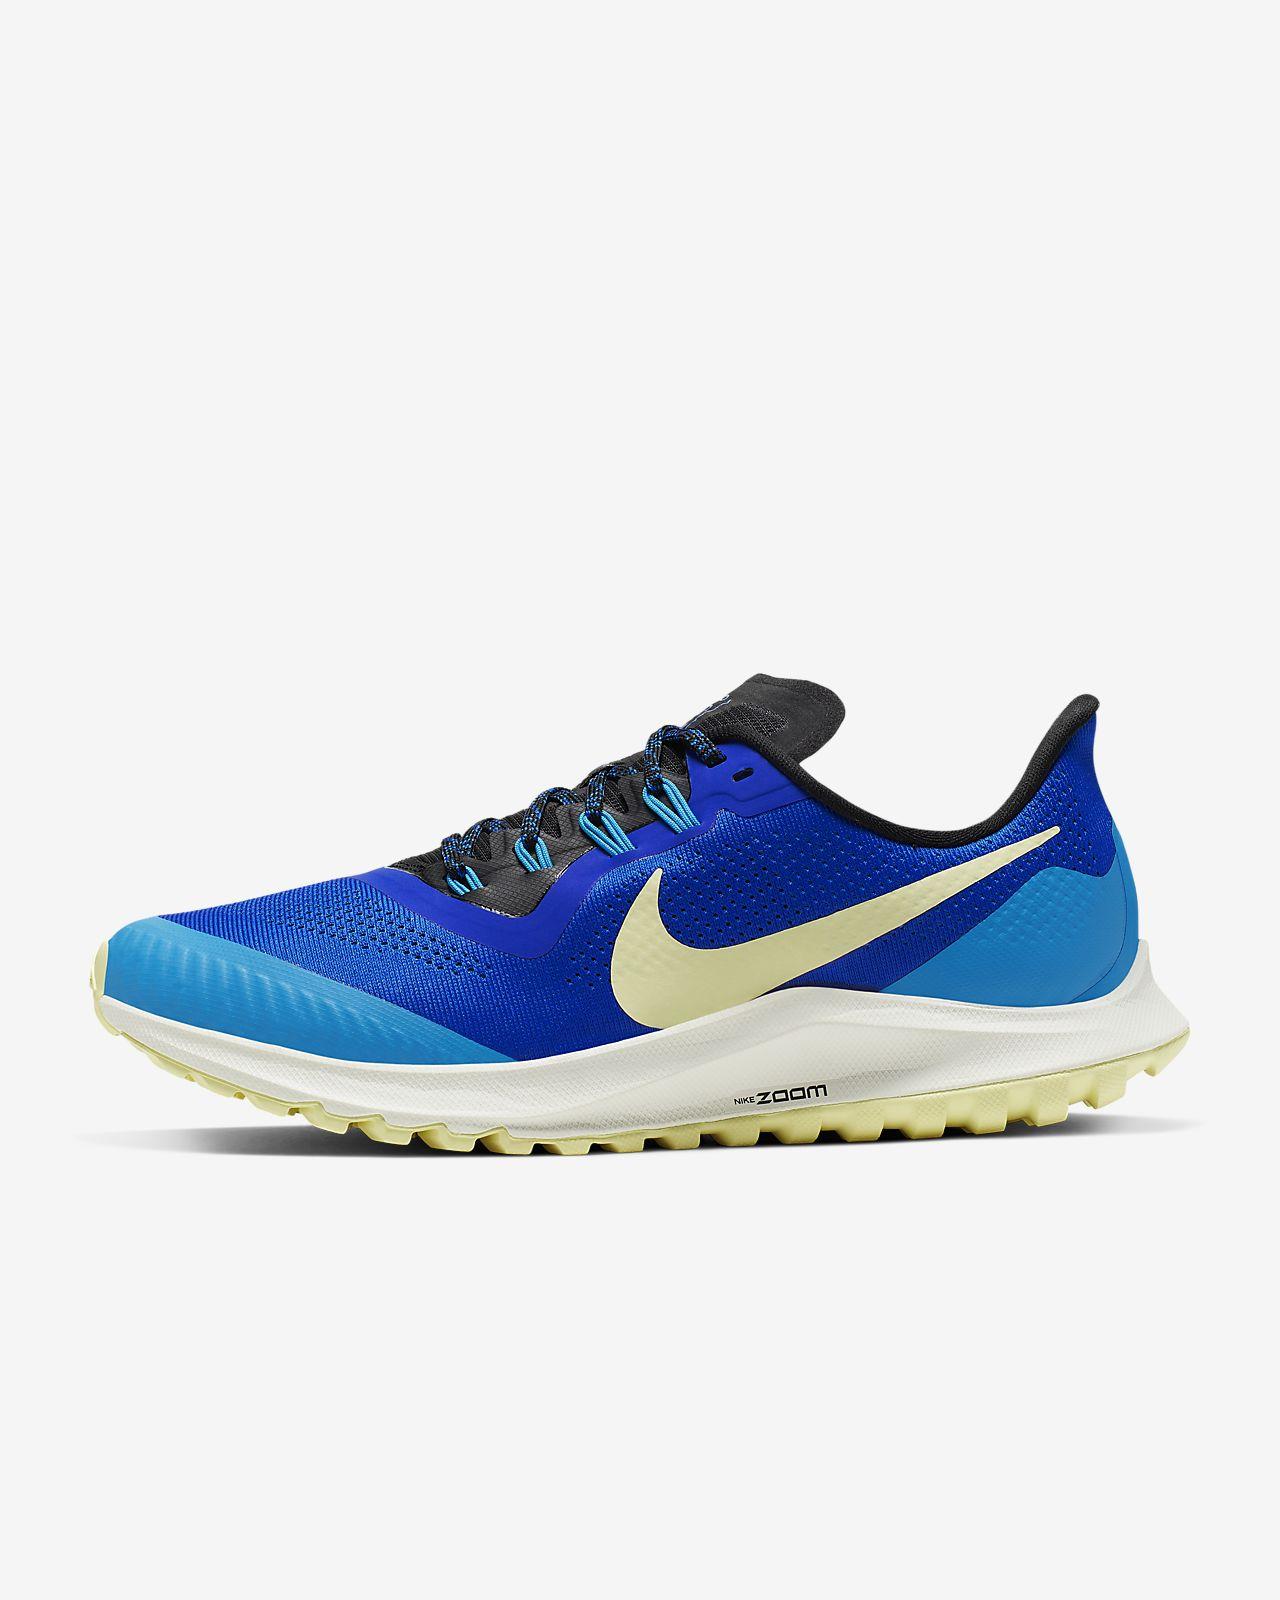 De Trail Chaussure Pour Homme 36 Air Zoom Pegasus Running Nike l3KTF1uJc